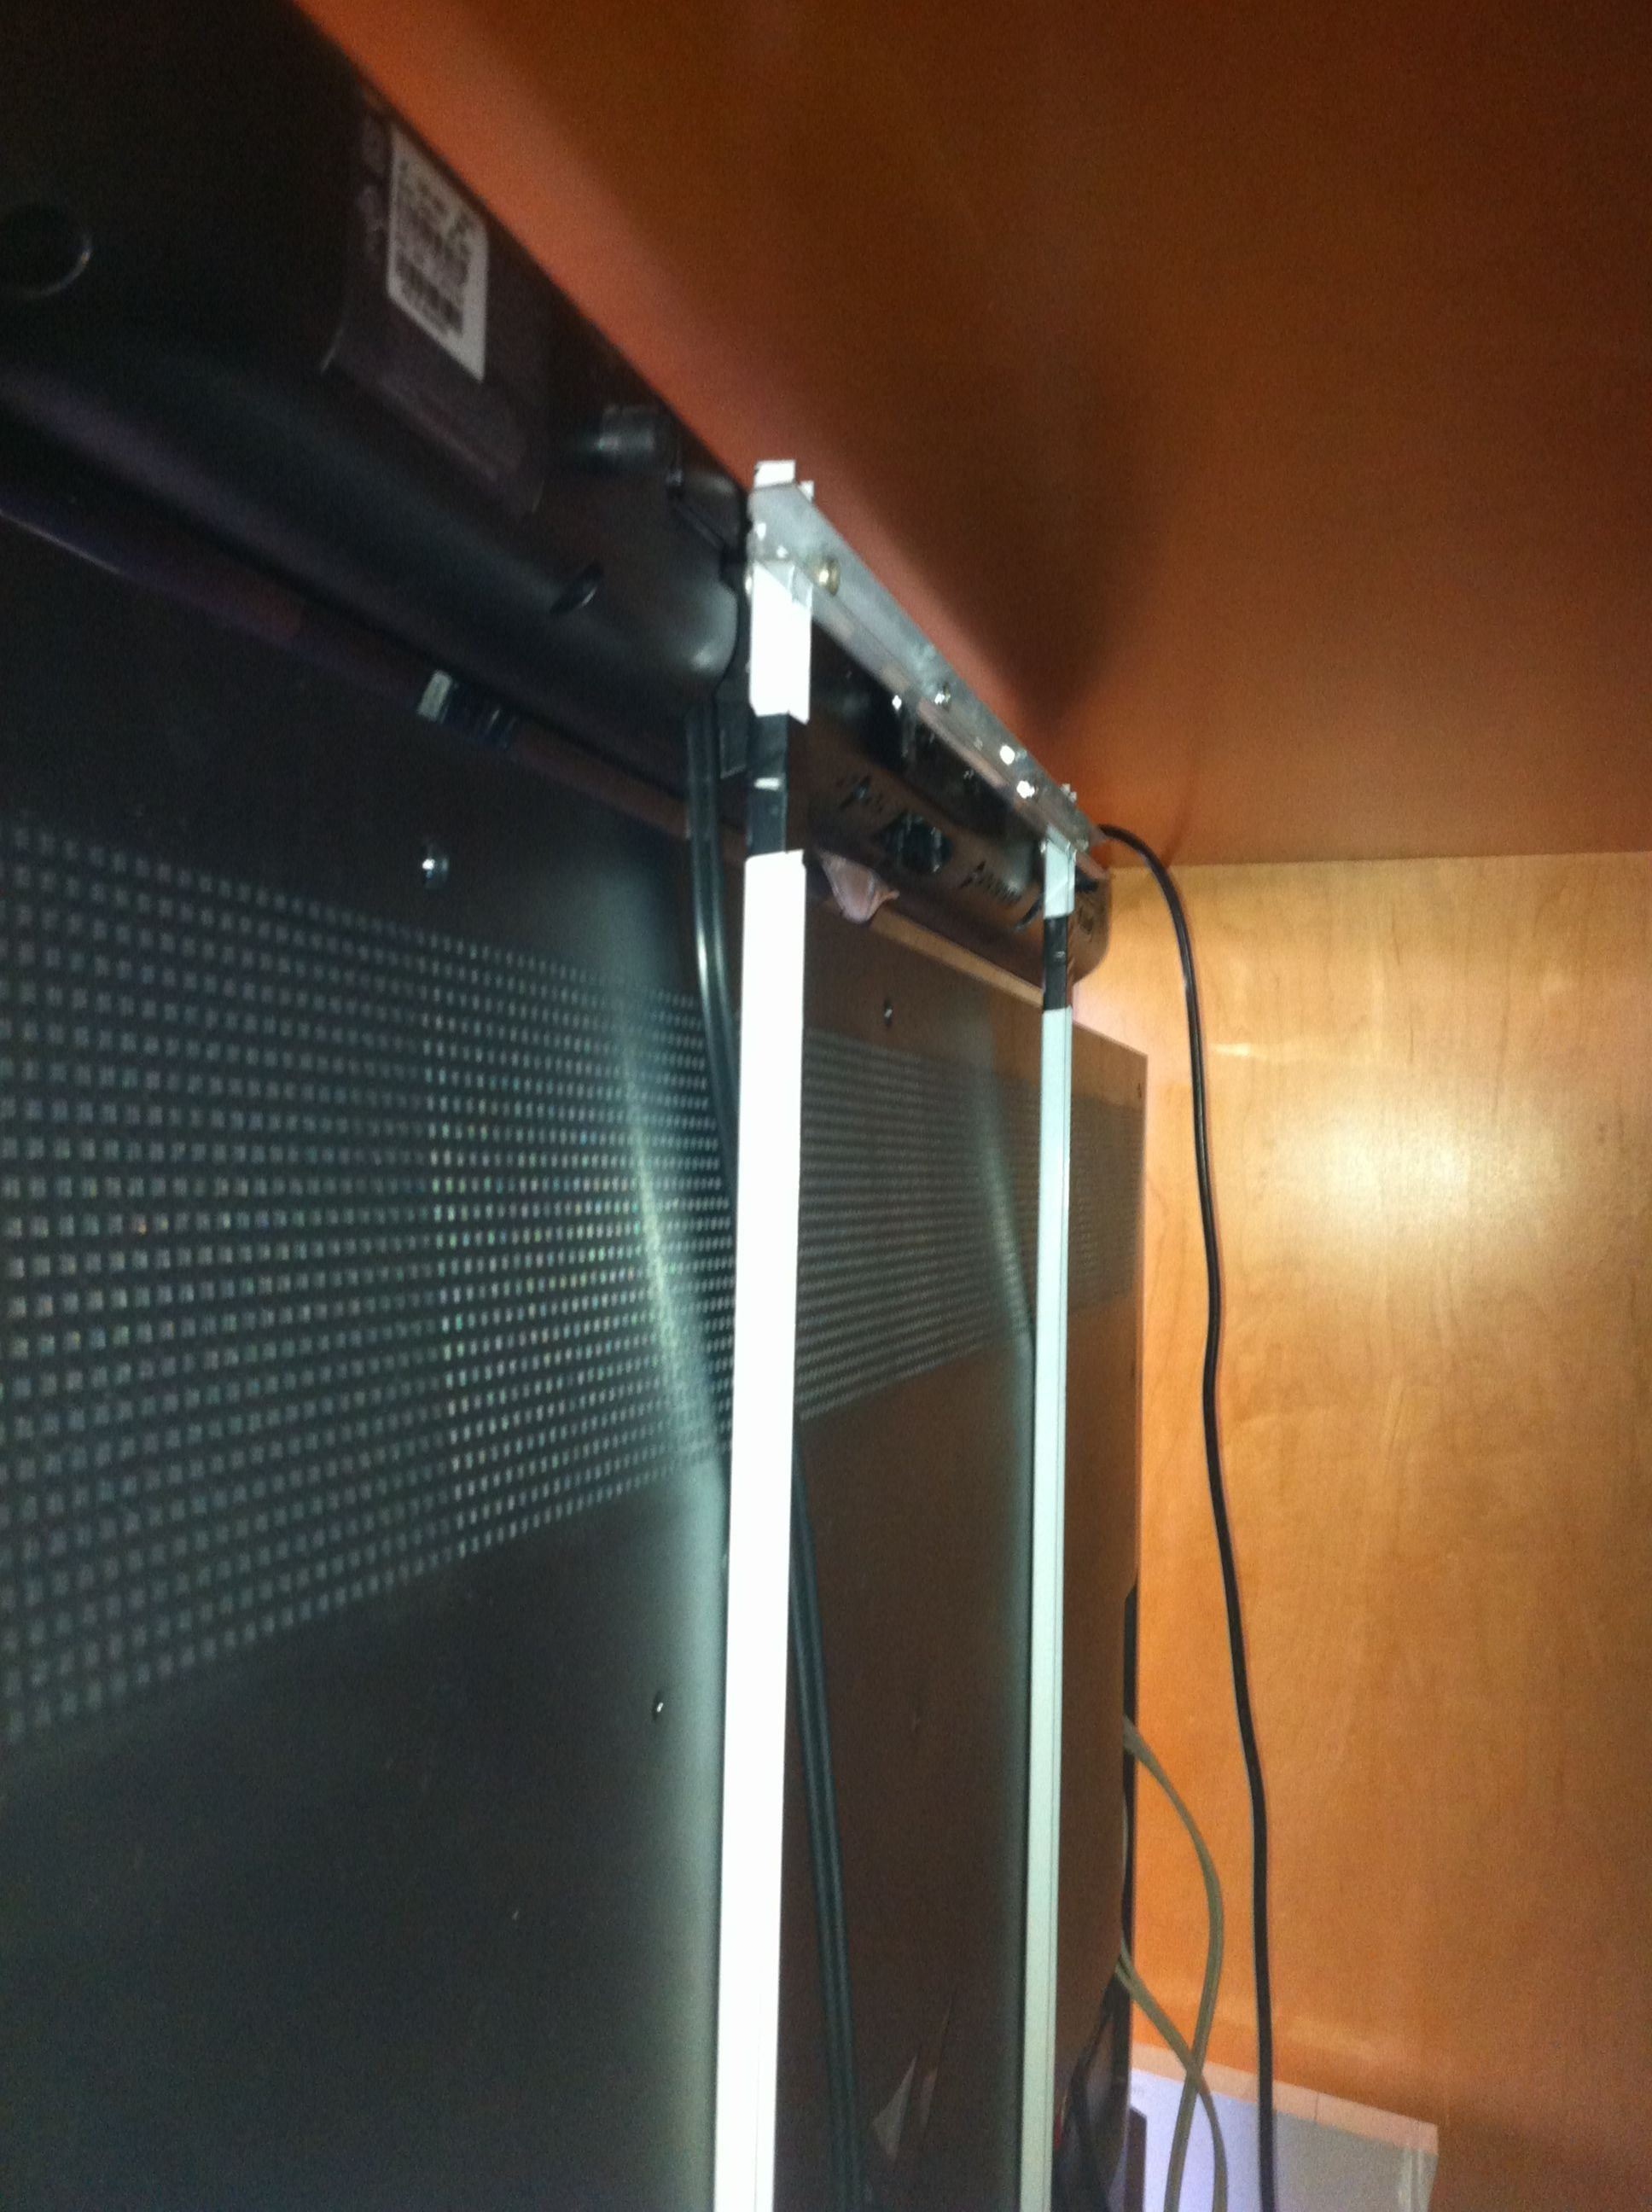 vizio tv sound bar. vizio tv sound bar